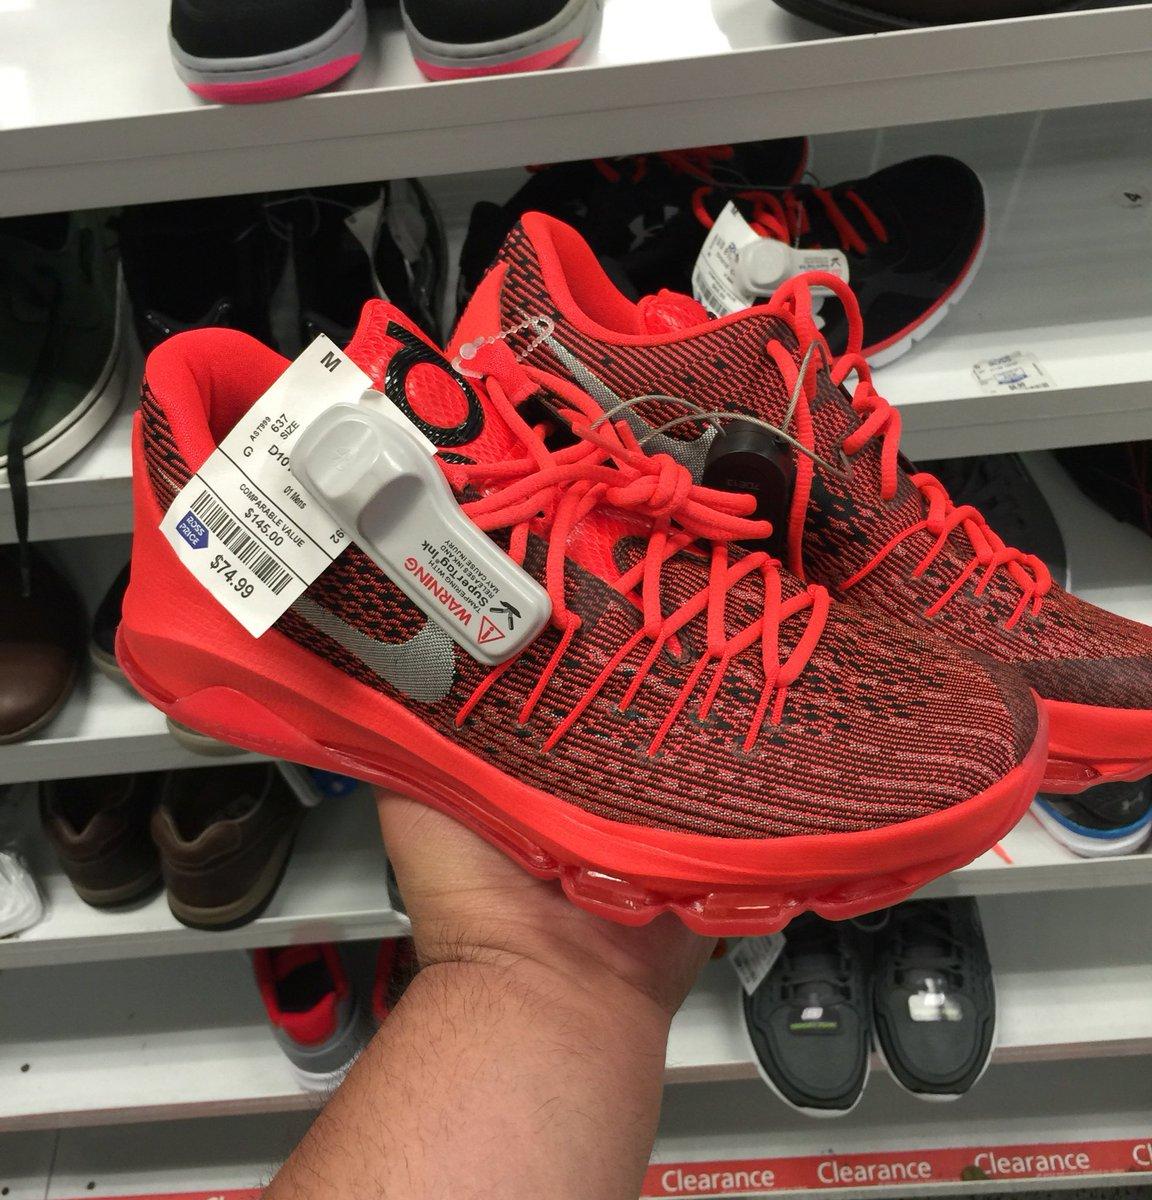 Nike Kd 8 74 99 Via Ross Brandon Fl Kotd Sneaker Twitter Com Pqpz4az7ui